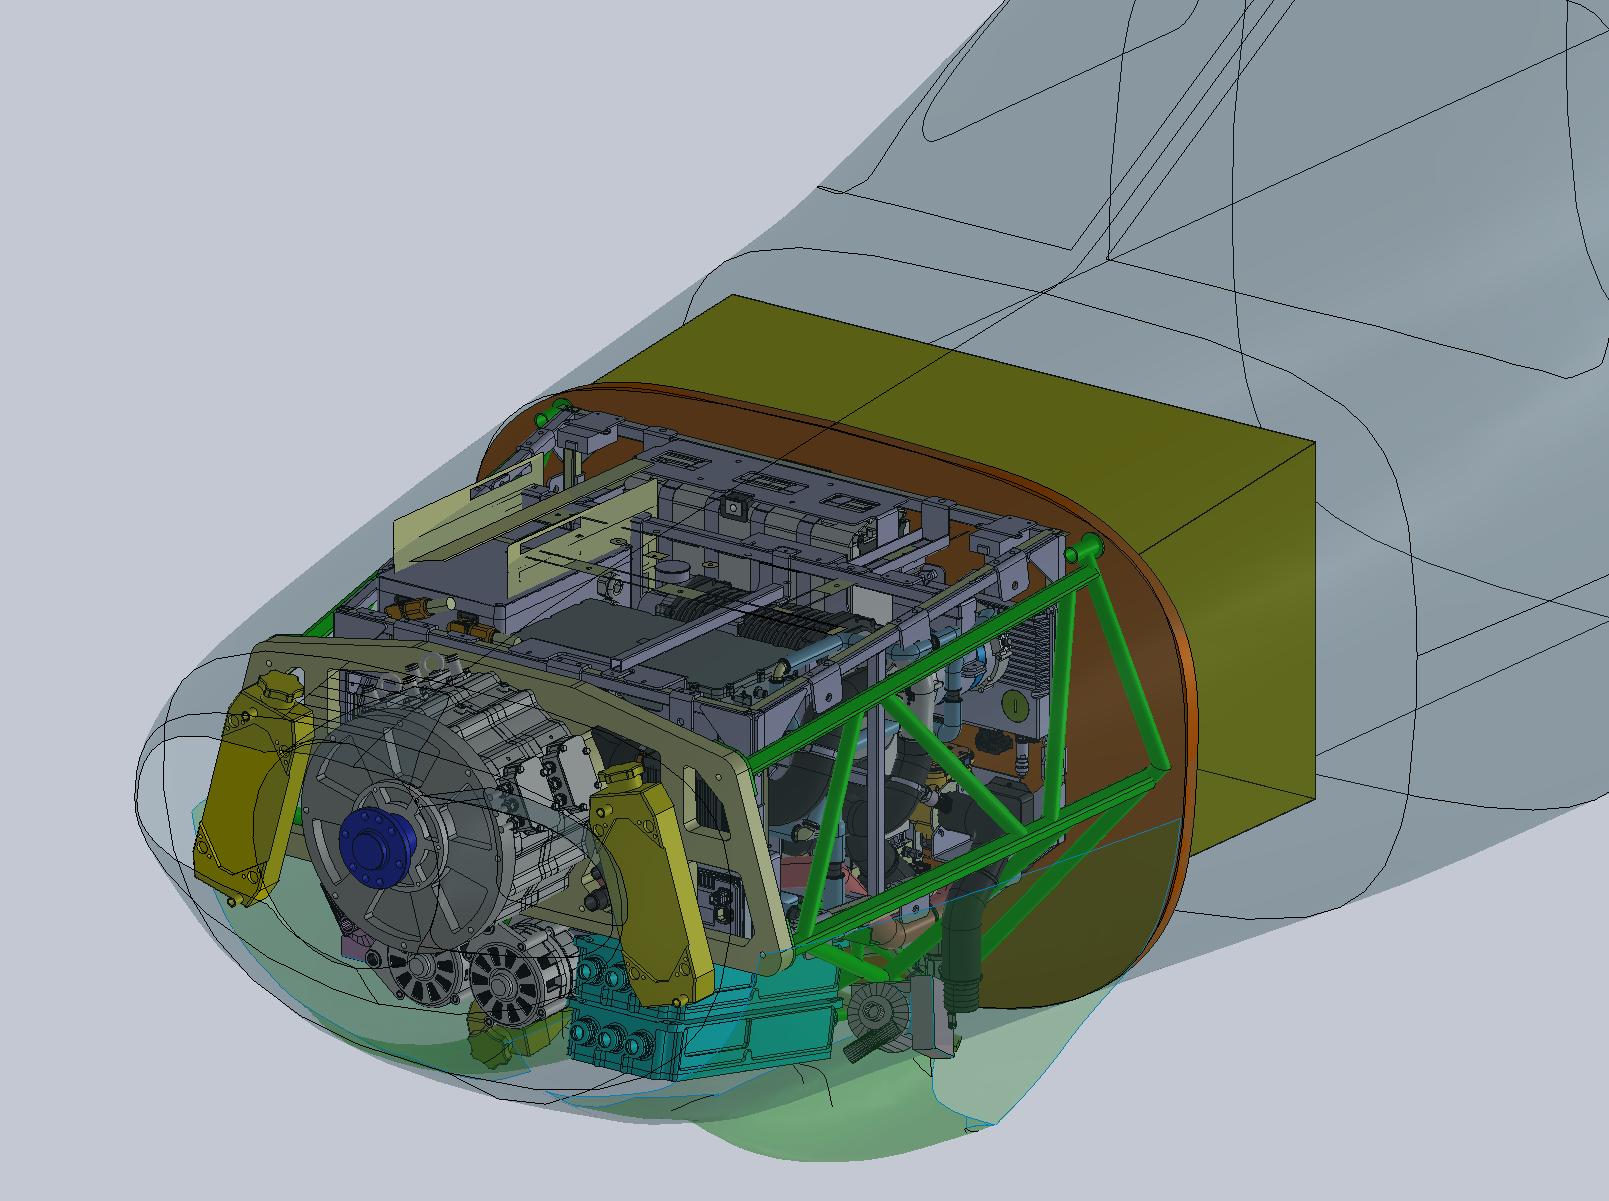 Gallery Hydrogen electric powertrain for aviation 3